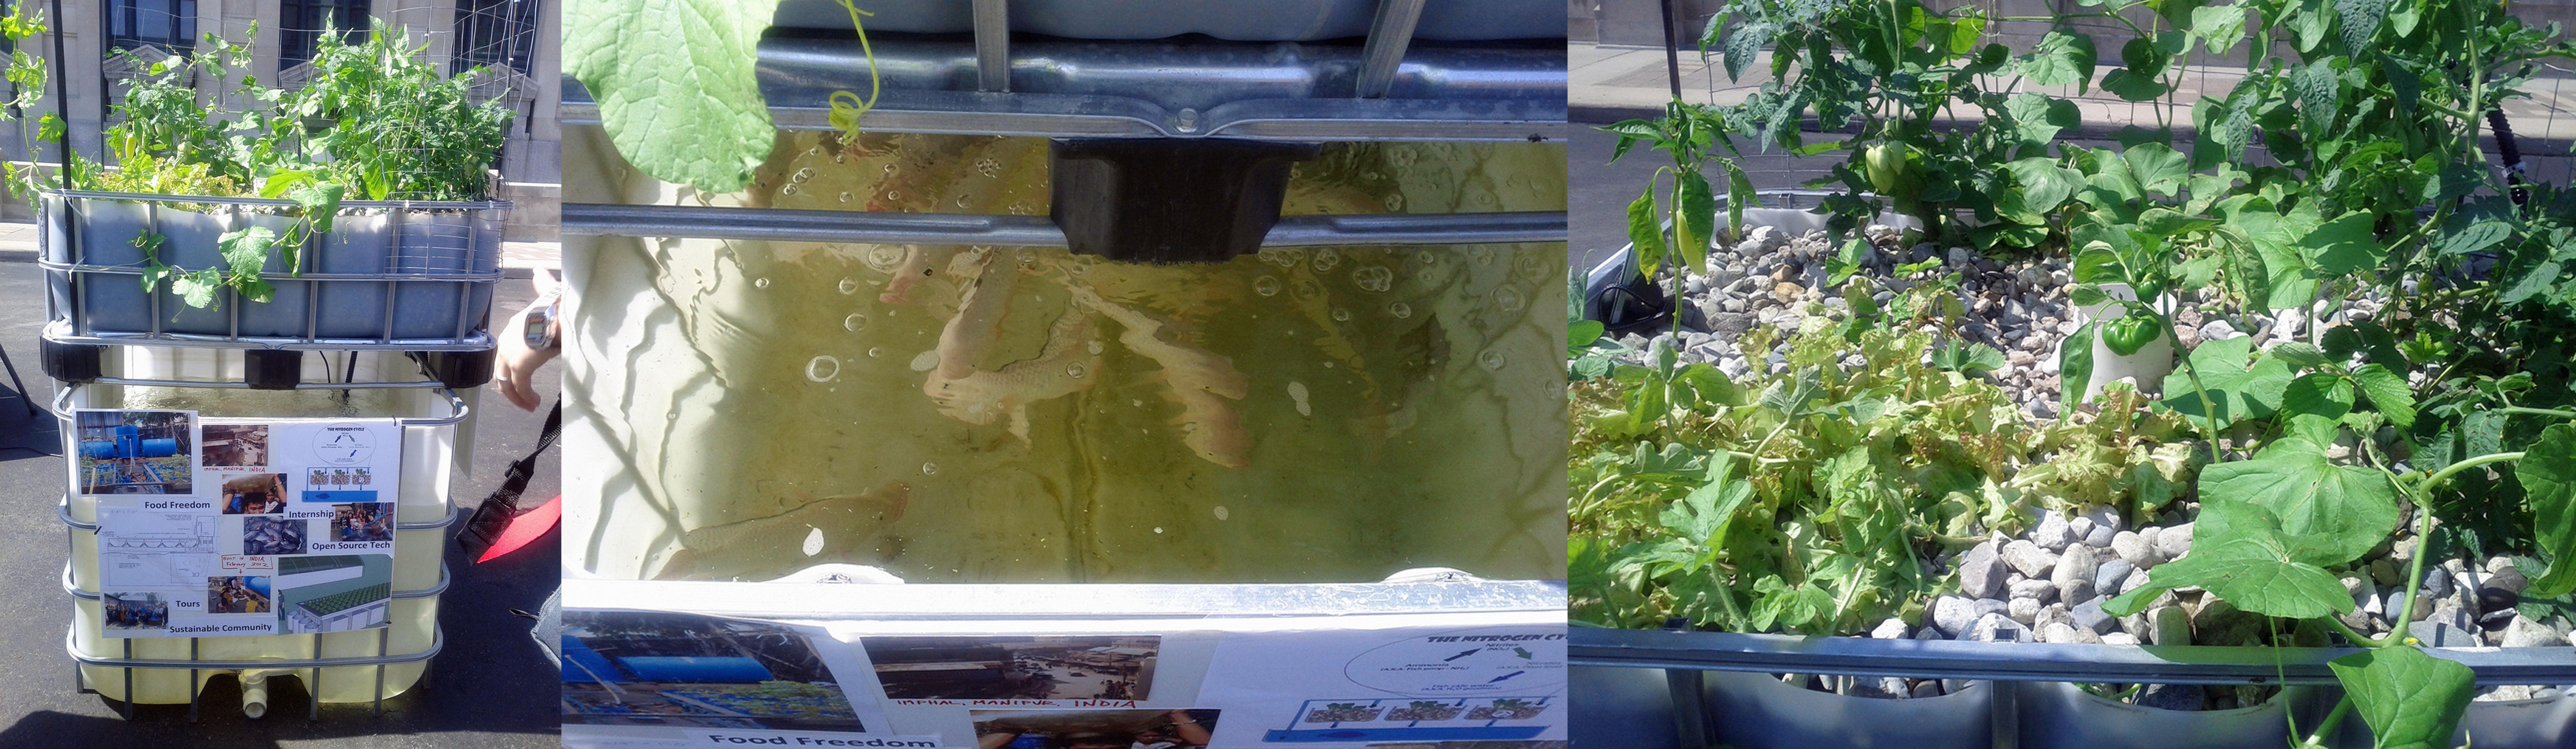 fishgarden